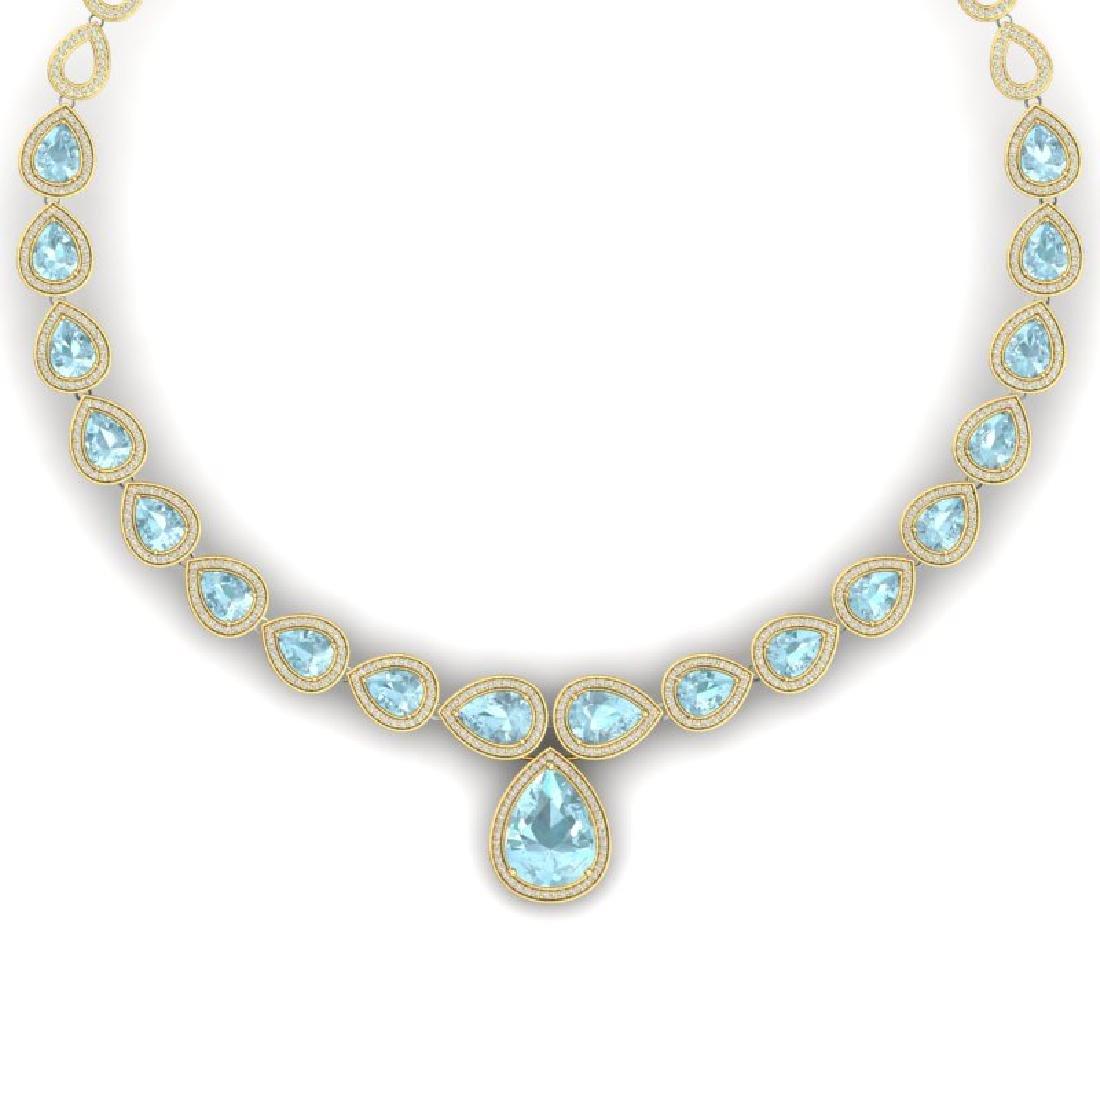 54 CTW Royalty Sky Topaz & VS Diamond Necklace 18K